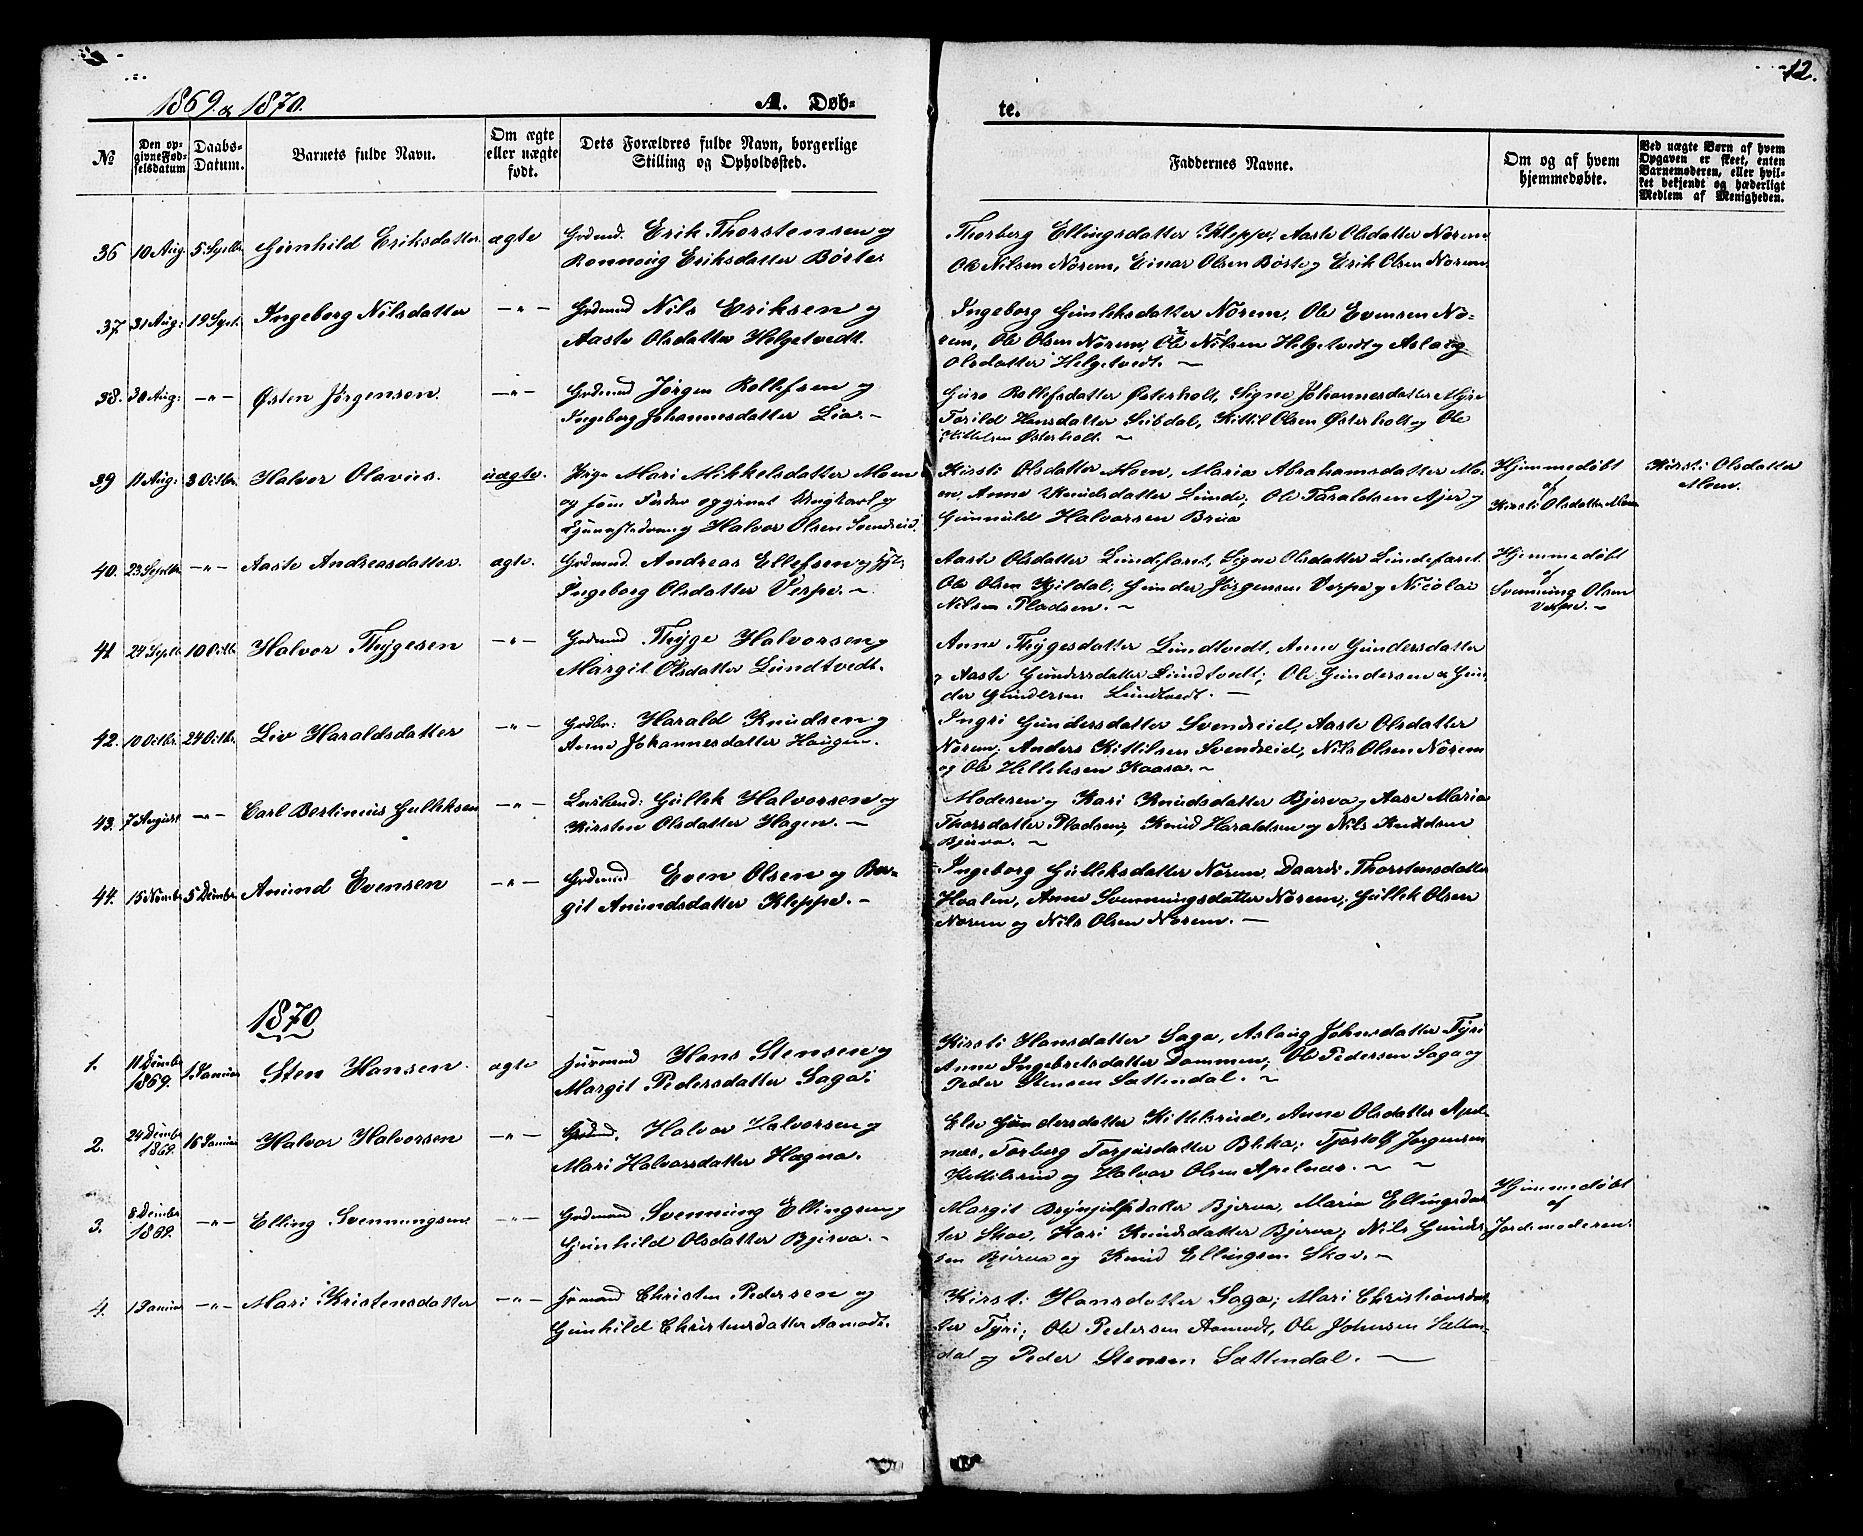 SAKO, Lunde kirkebøker, F/Fa/L0001: Ministerialbok nr. I 1, 1866-1883, s. 12